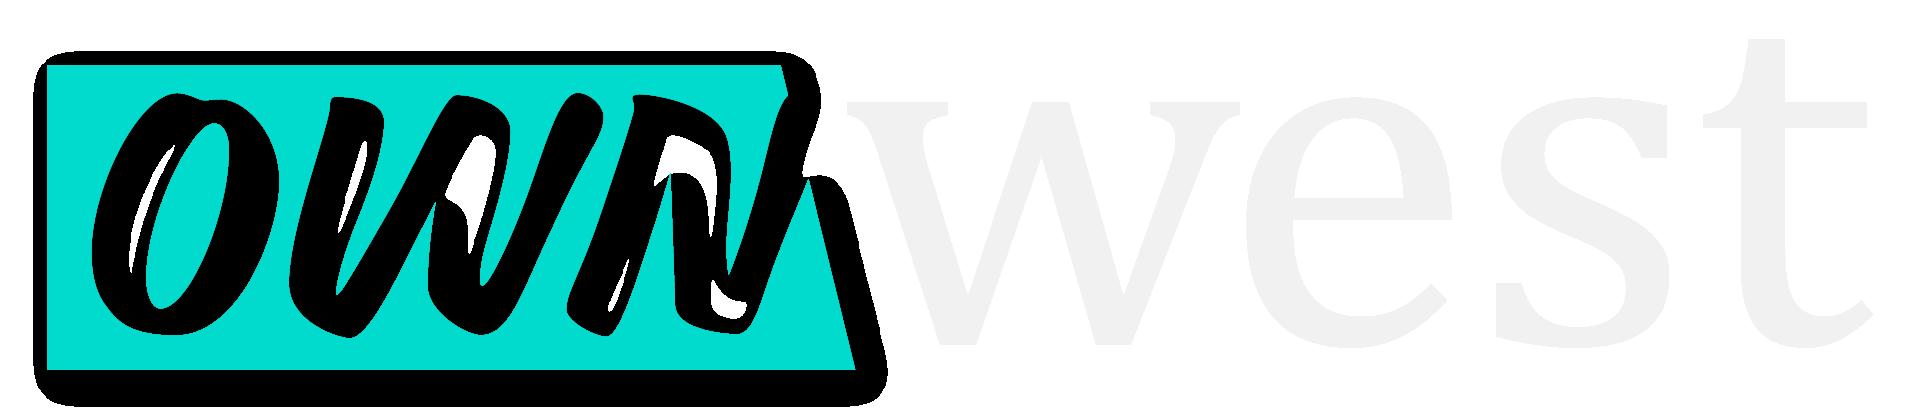 OwnWest light logo.png